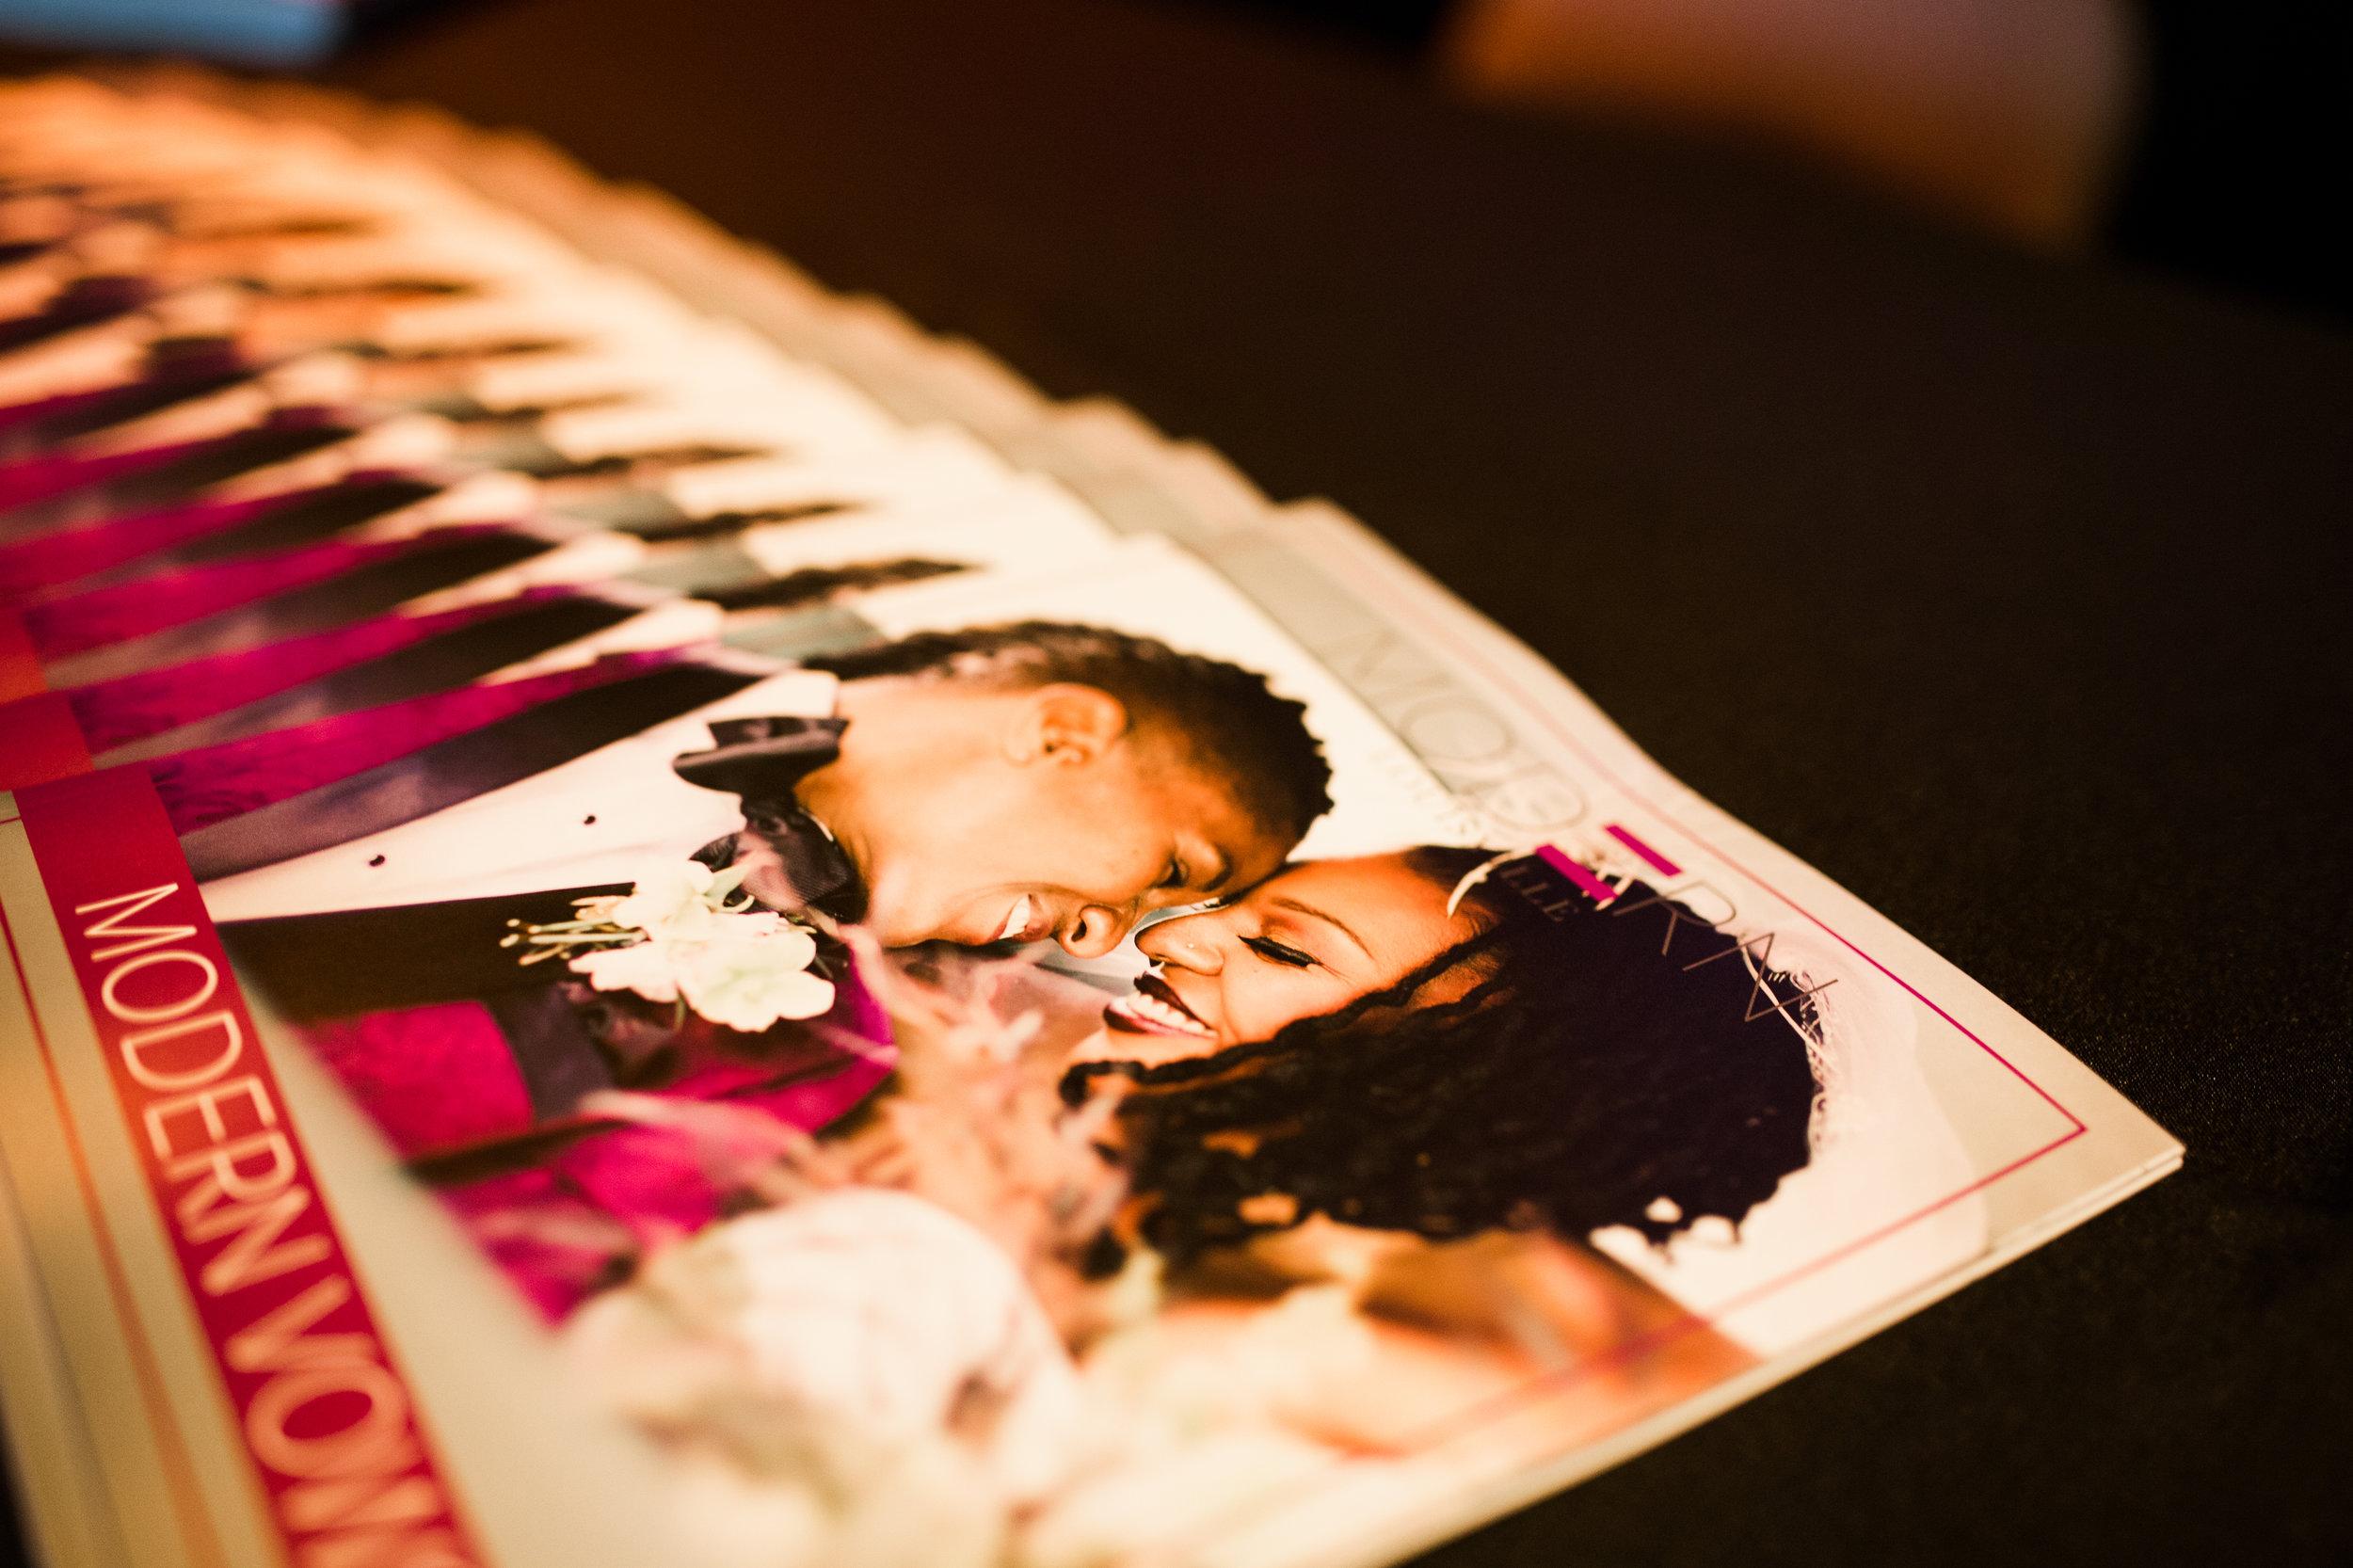 Modern Louisville Magazine Modern Vows Launch Party at Mercury Ballroom 5-17-17 Crystal Ludwick Photo 1.jpg